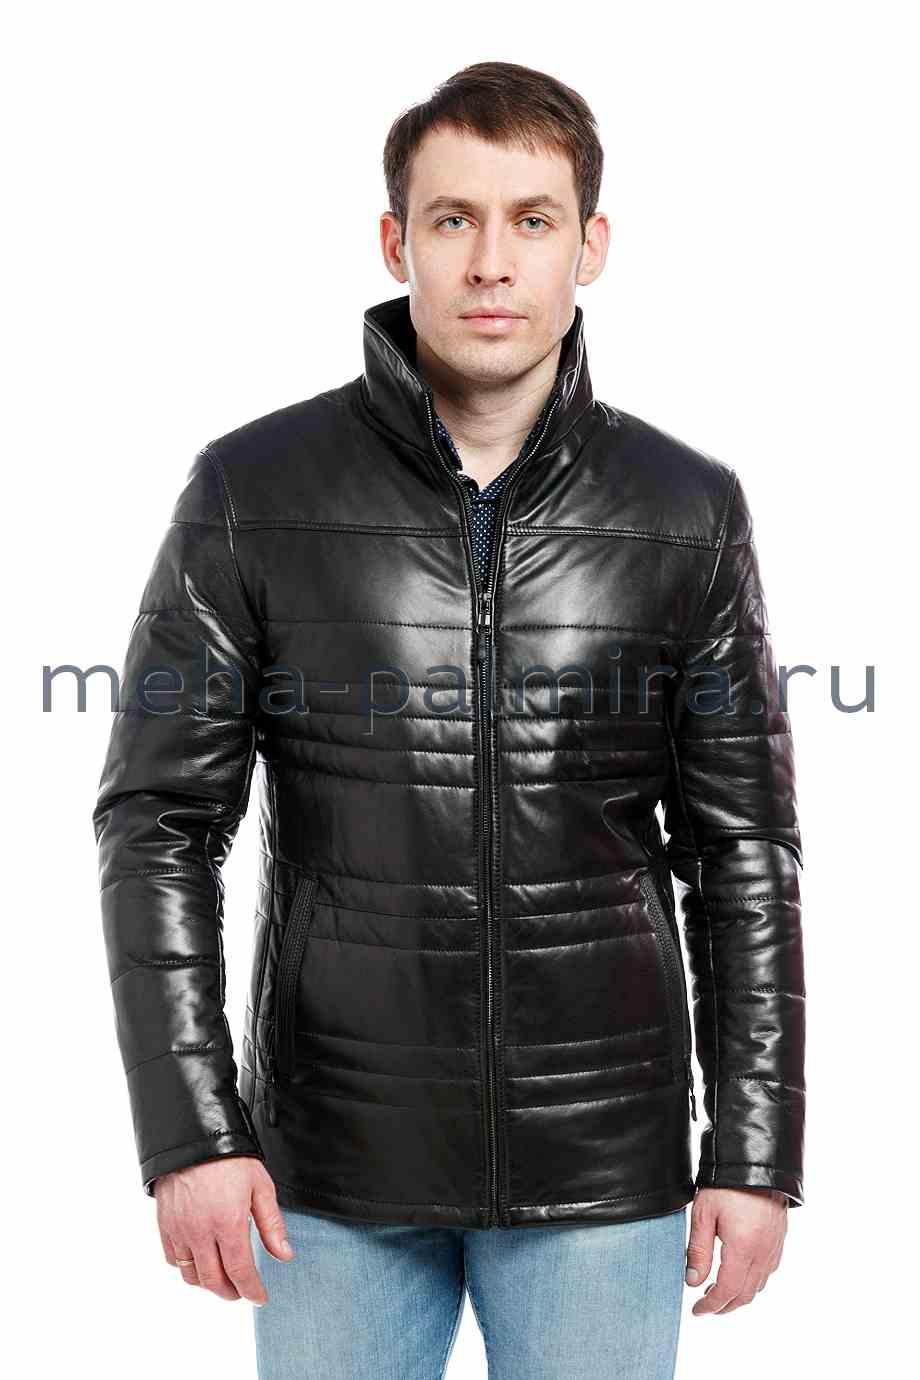 Мужская куртка из кожи на тинсулейте